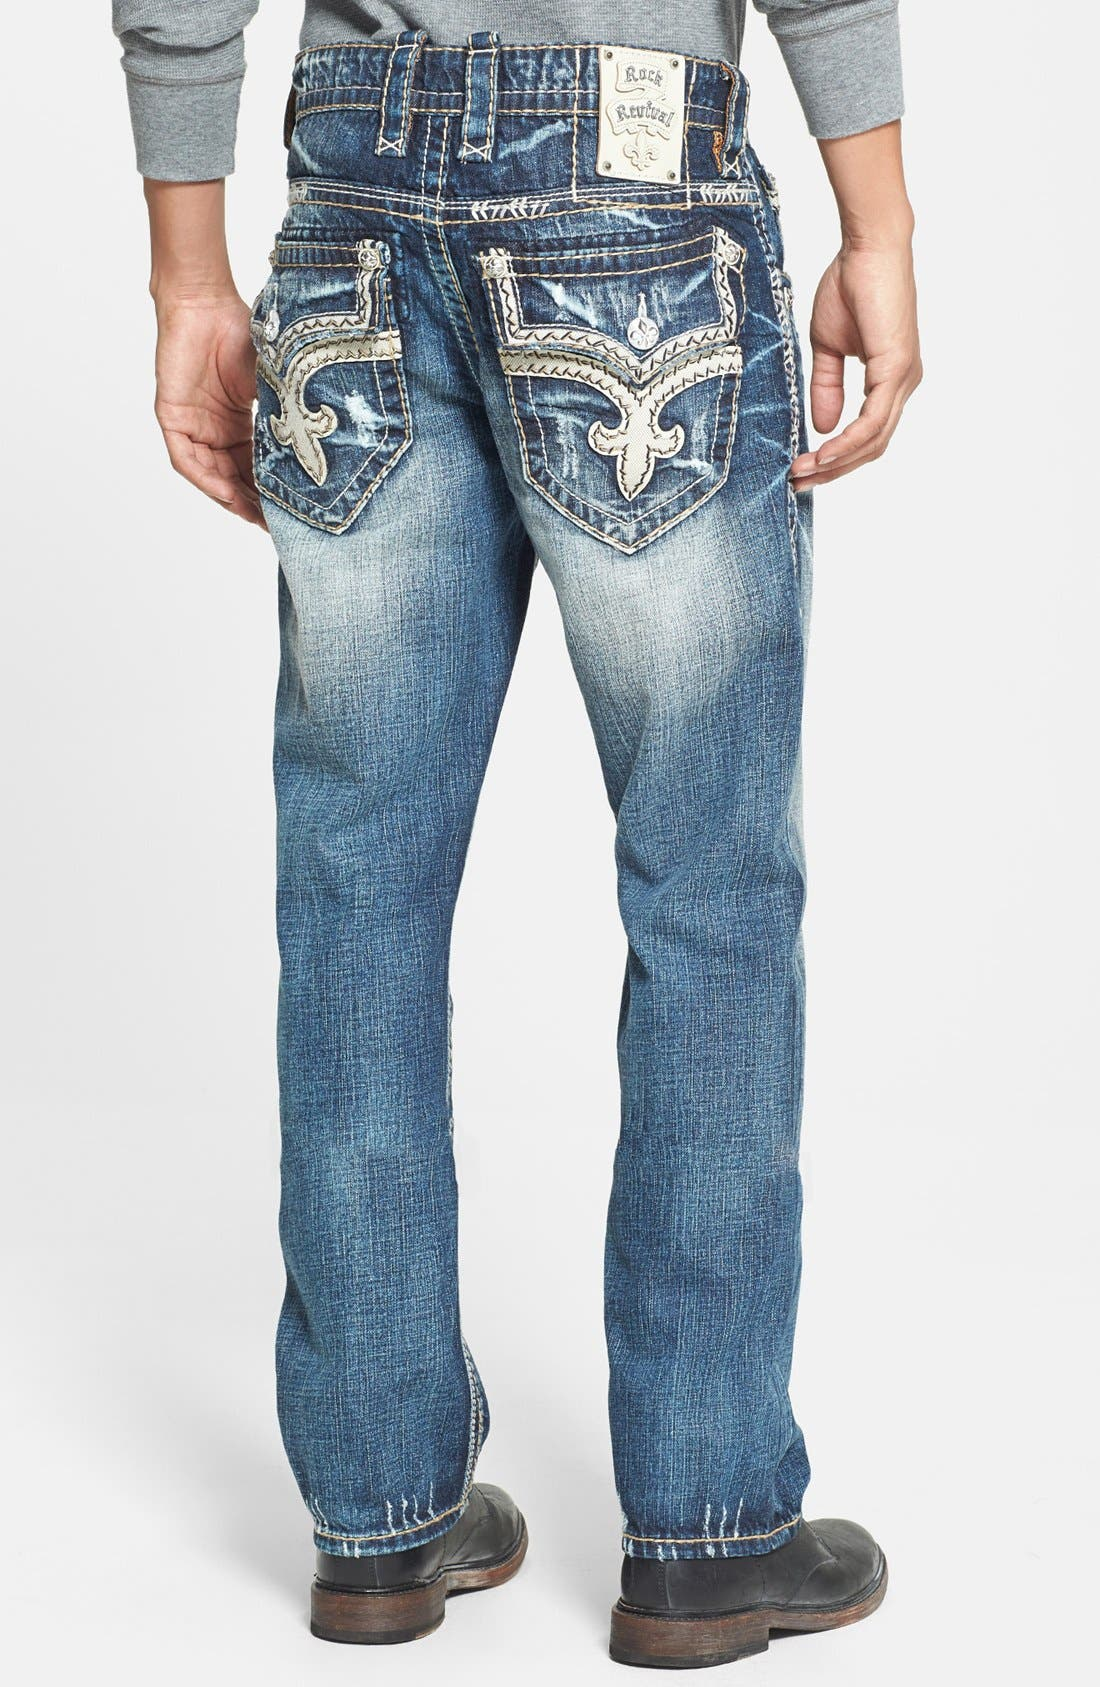 Alternate Image 1 Selected - Rock Revival 'Teo' Straight Leg Jeans (Medium Blue)